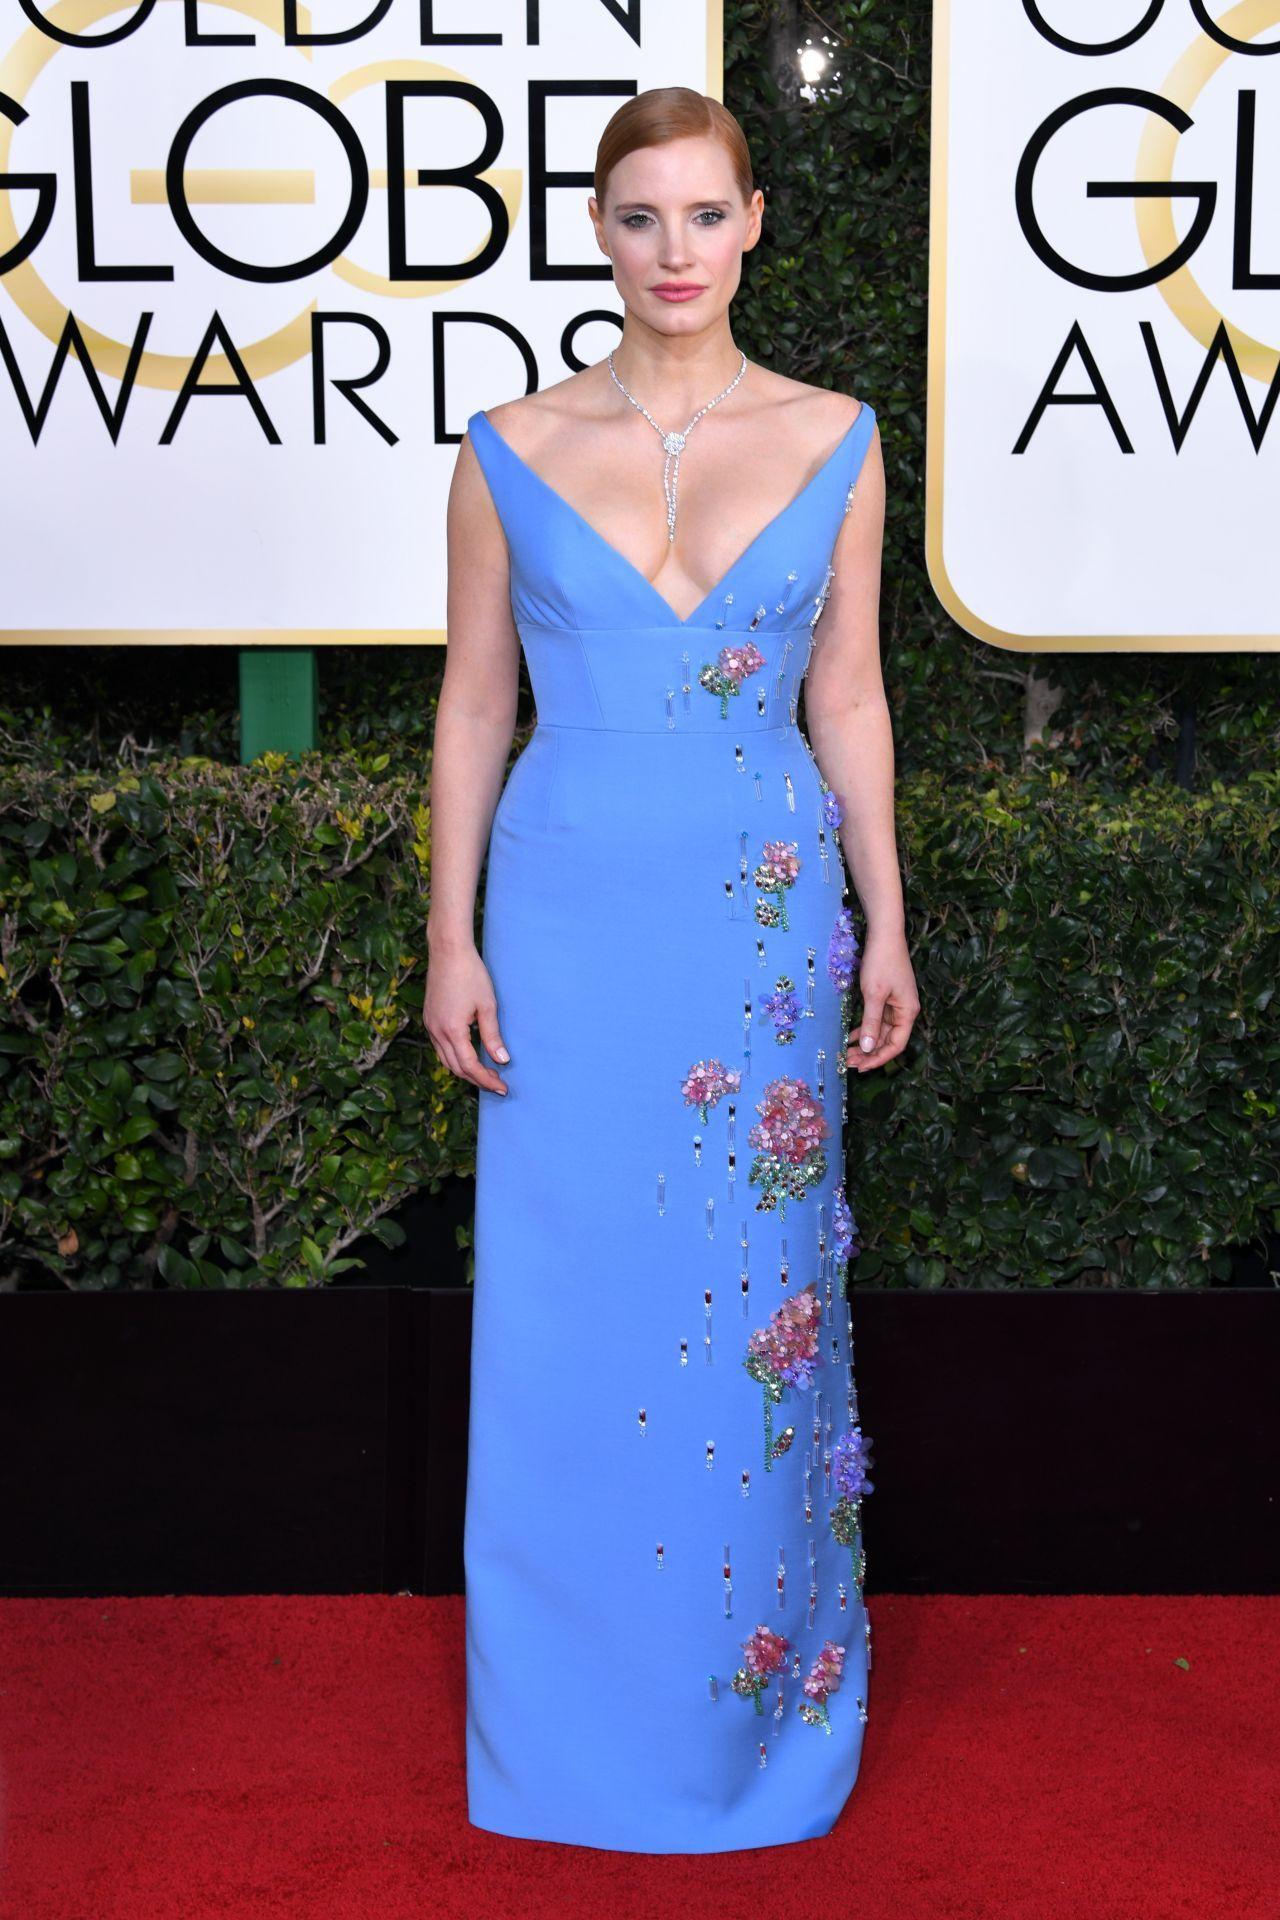 Jessica Chastain in Prada at 2017 Golden Globe Awards in Beverly Hills